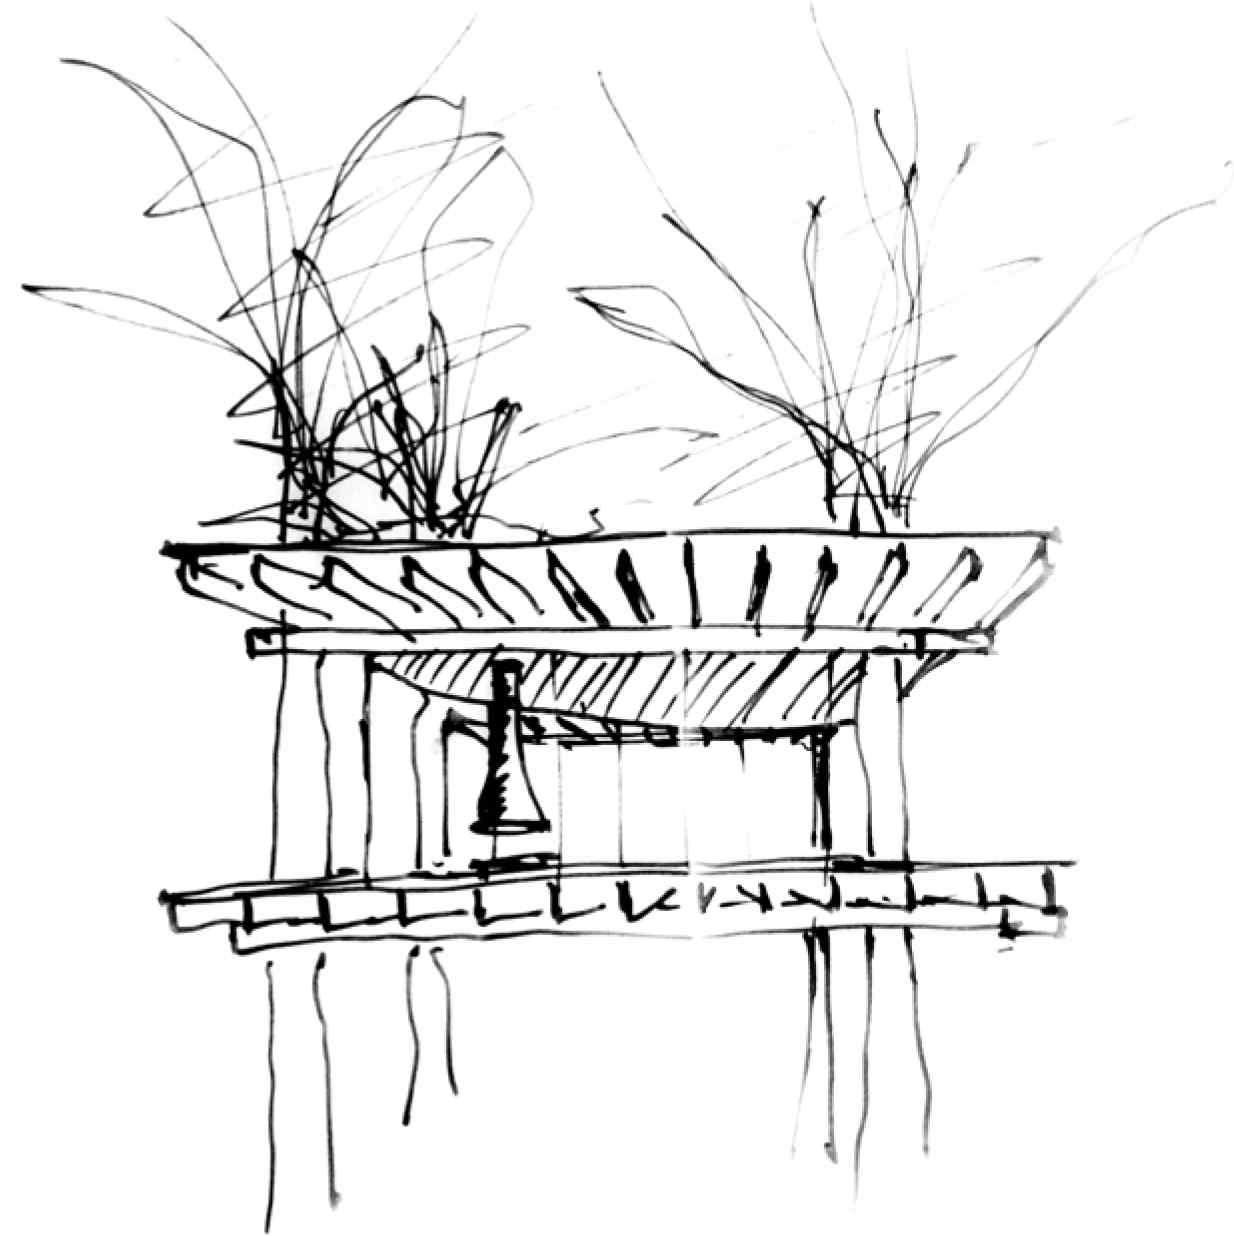 Tree house skica 1